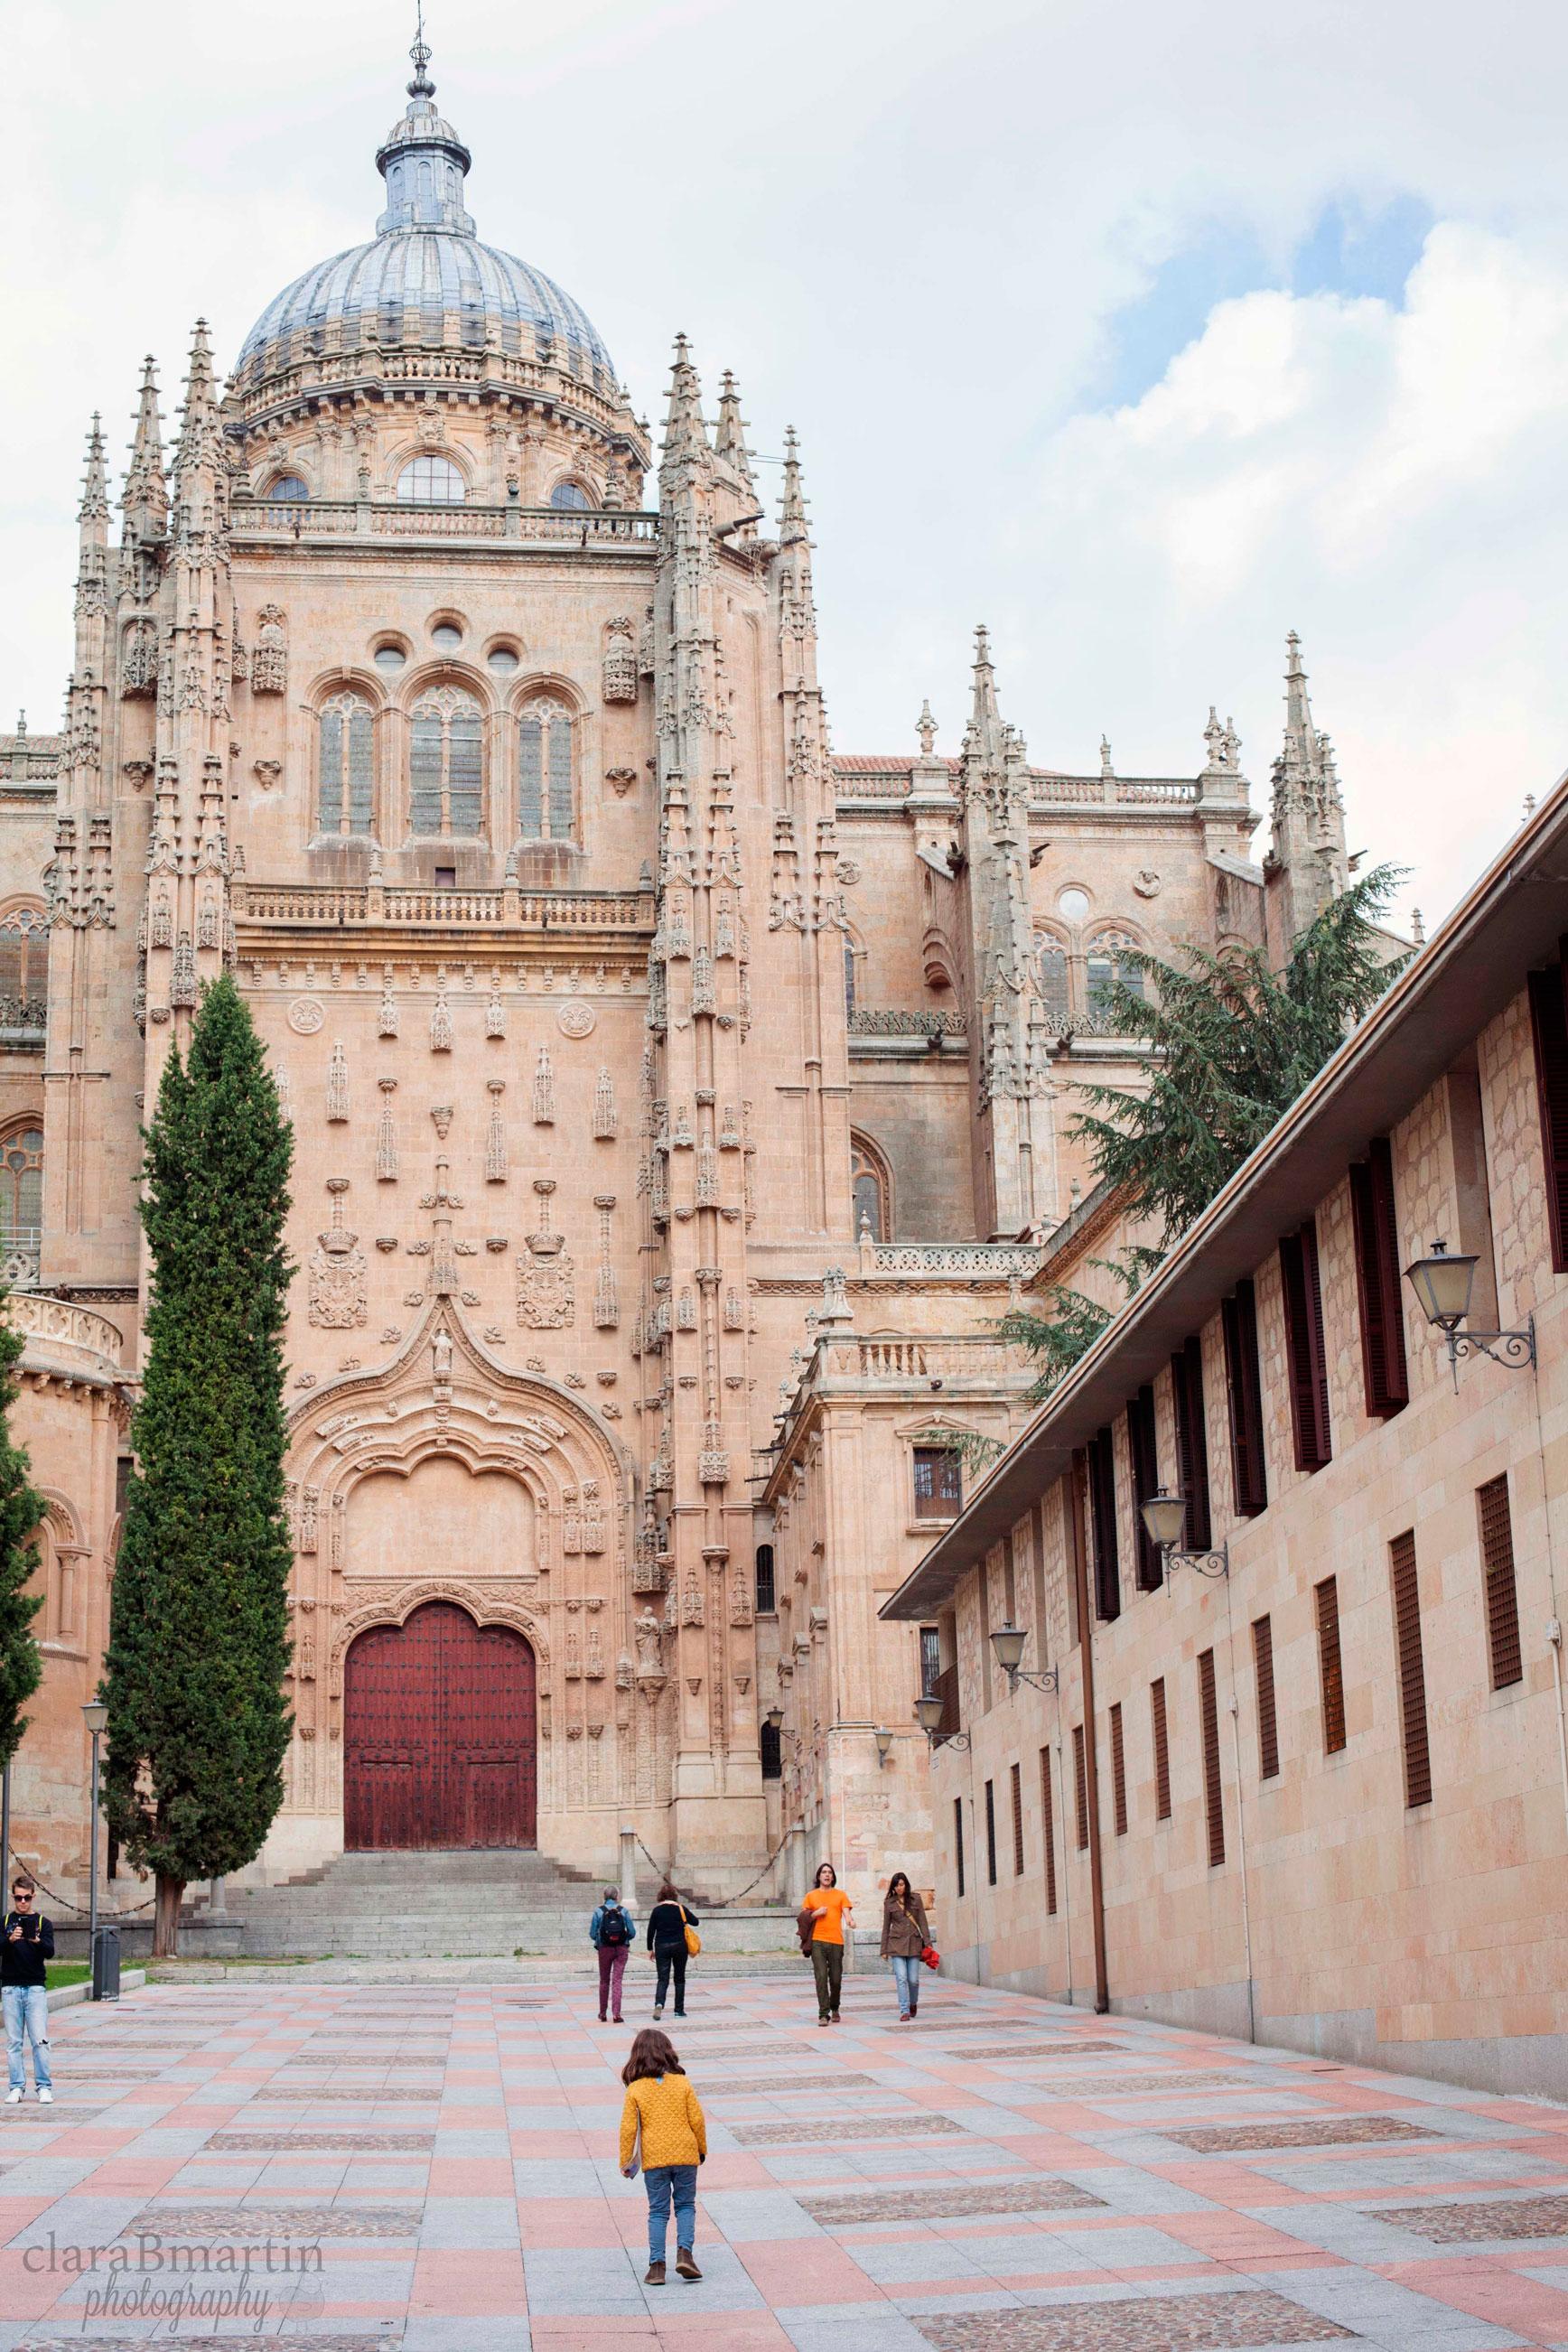 Descubriendo Salamanca